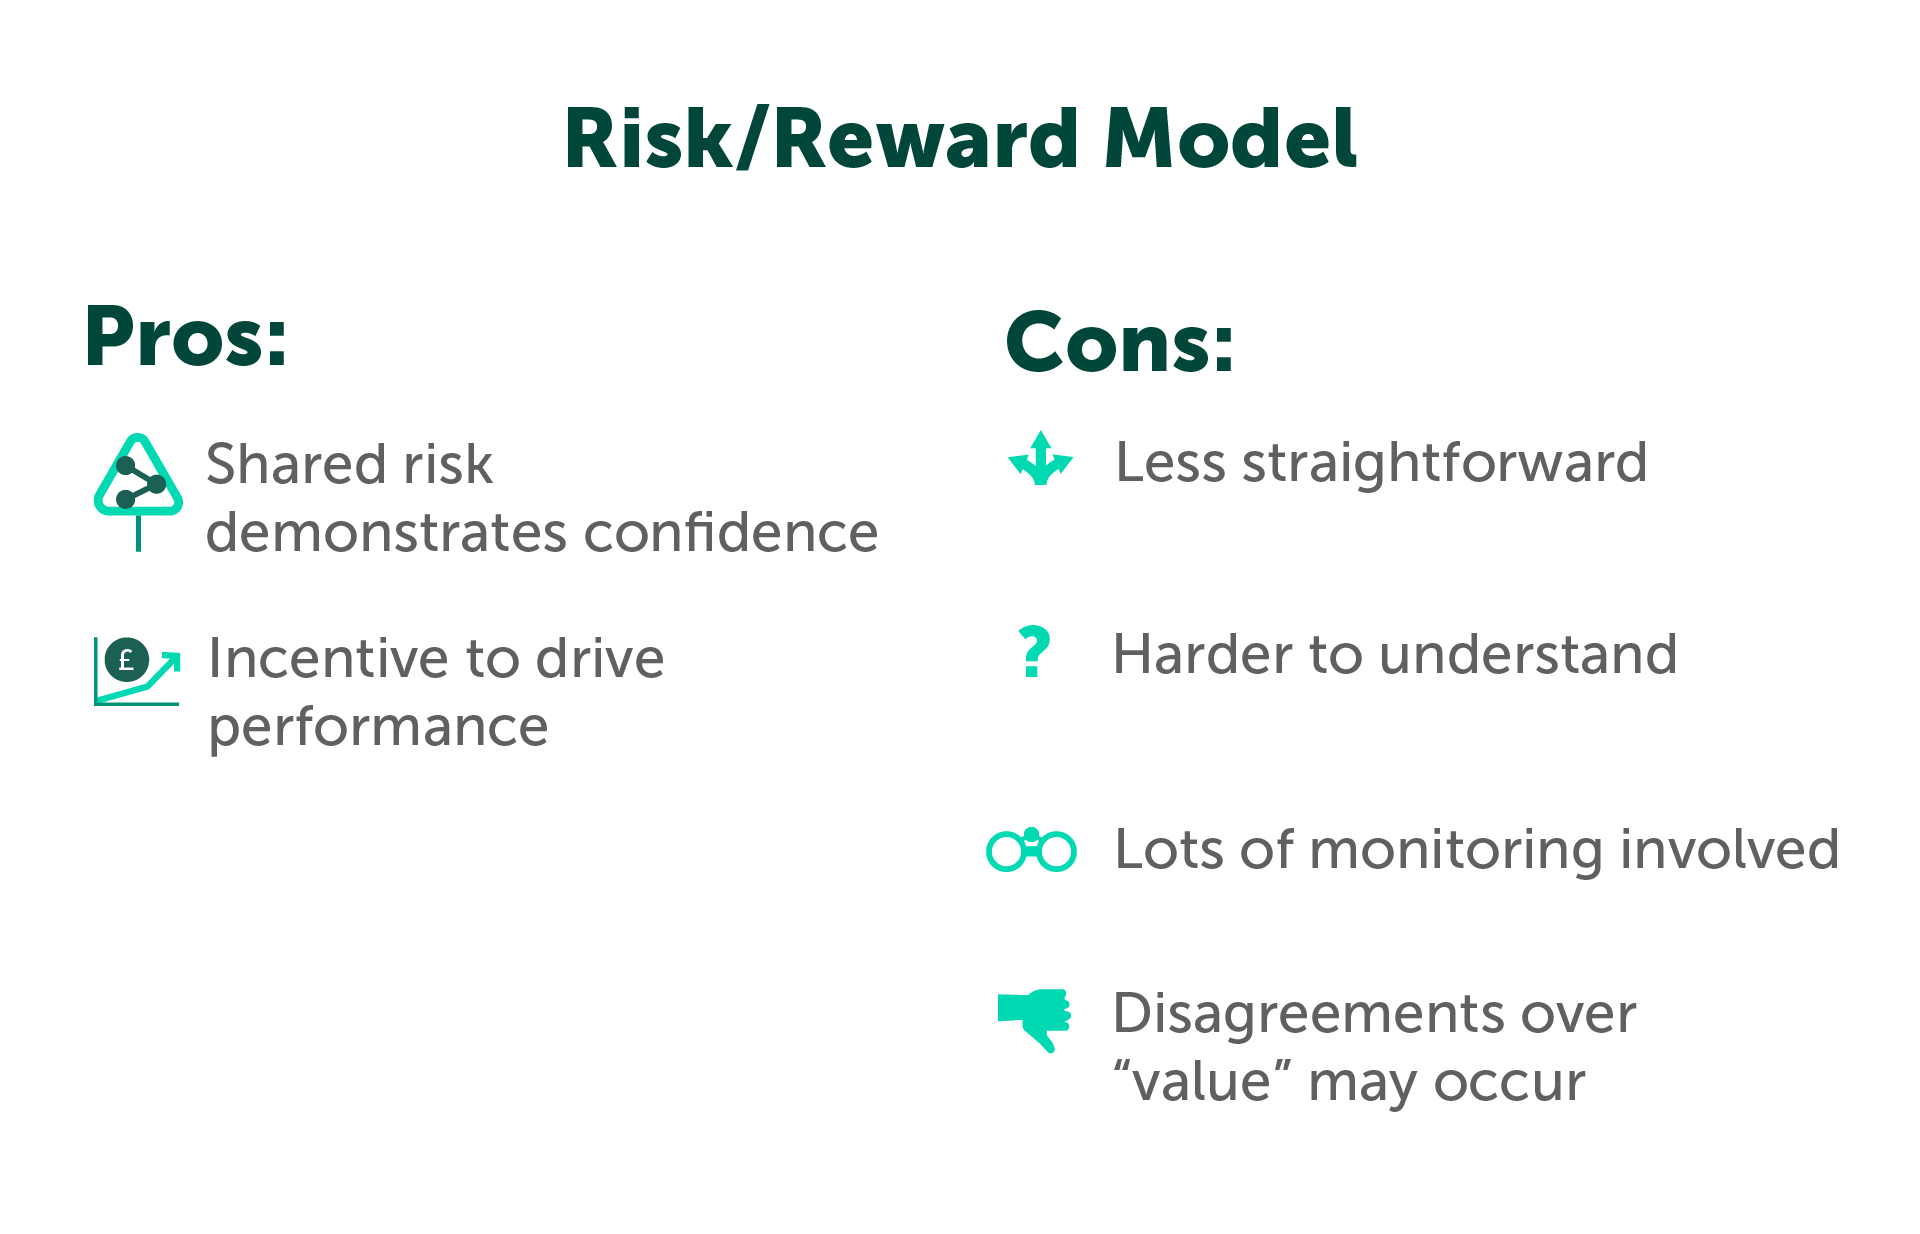 Risk Reward model